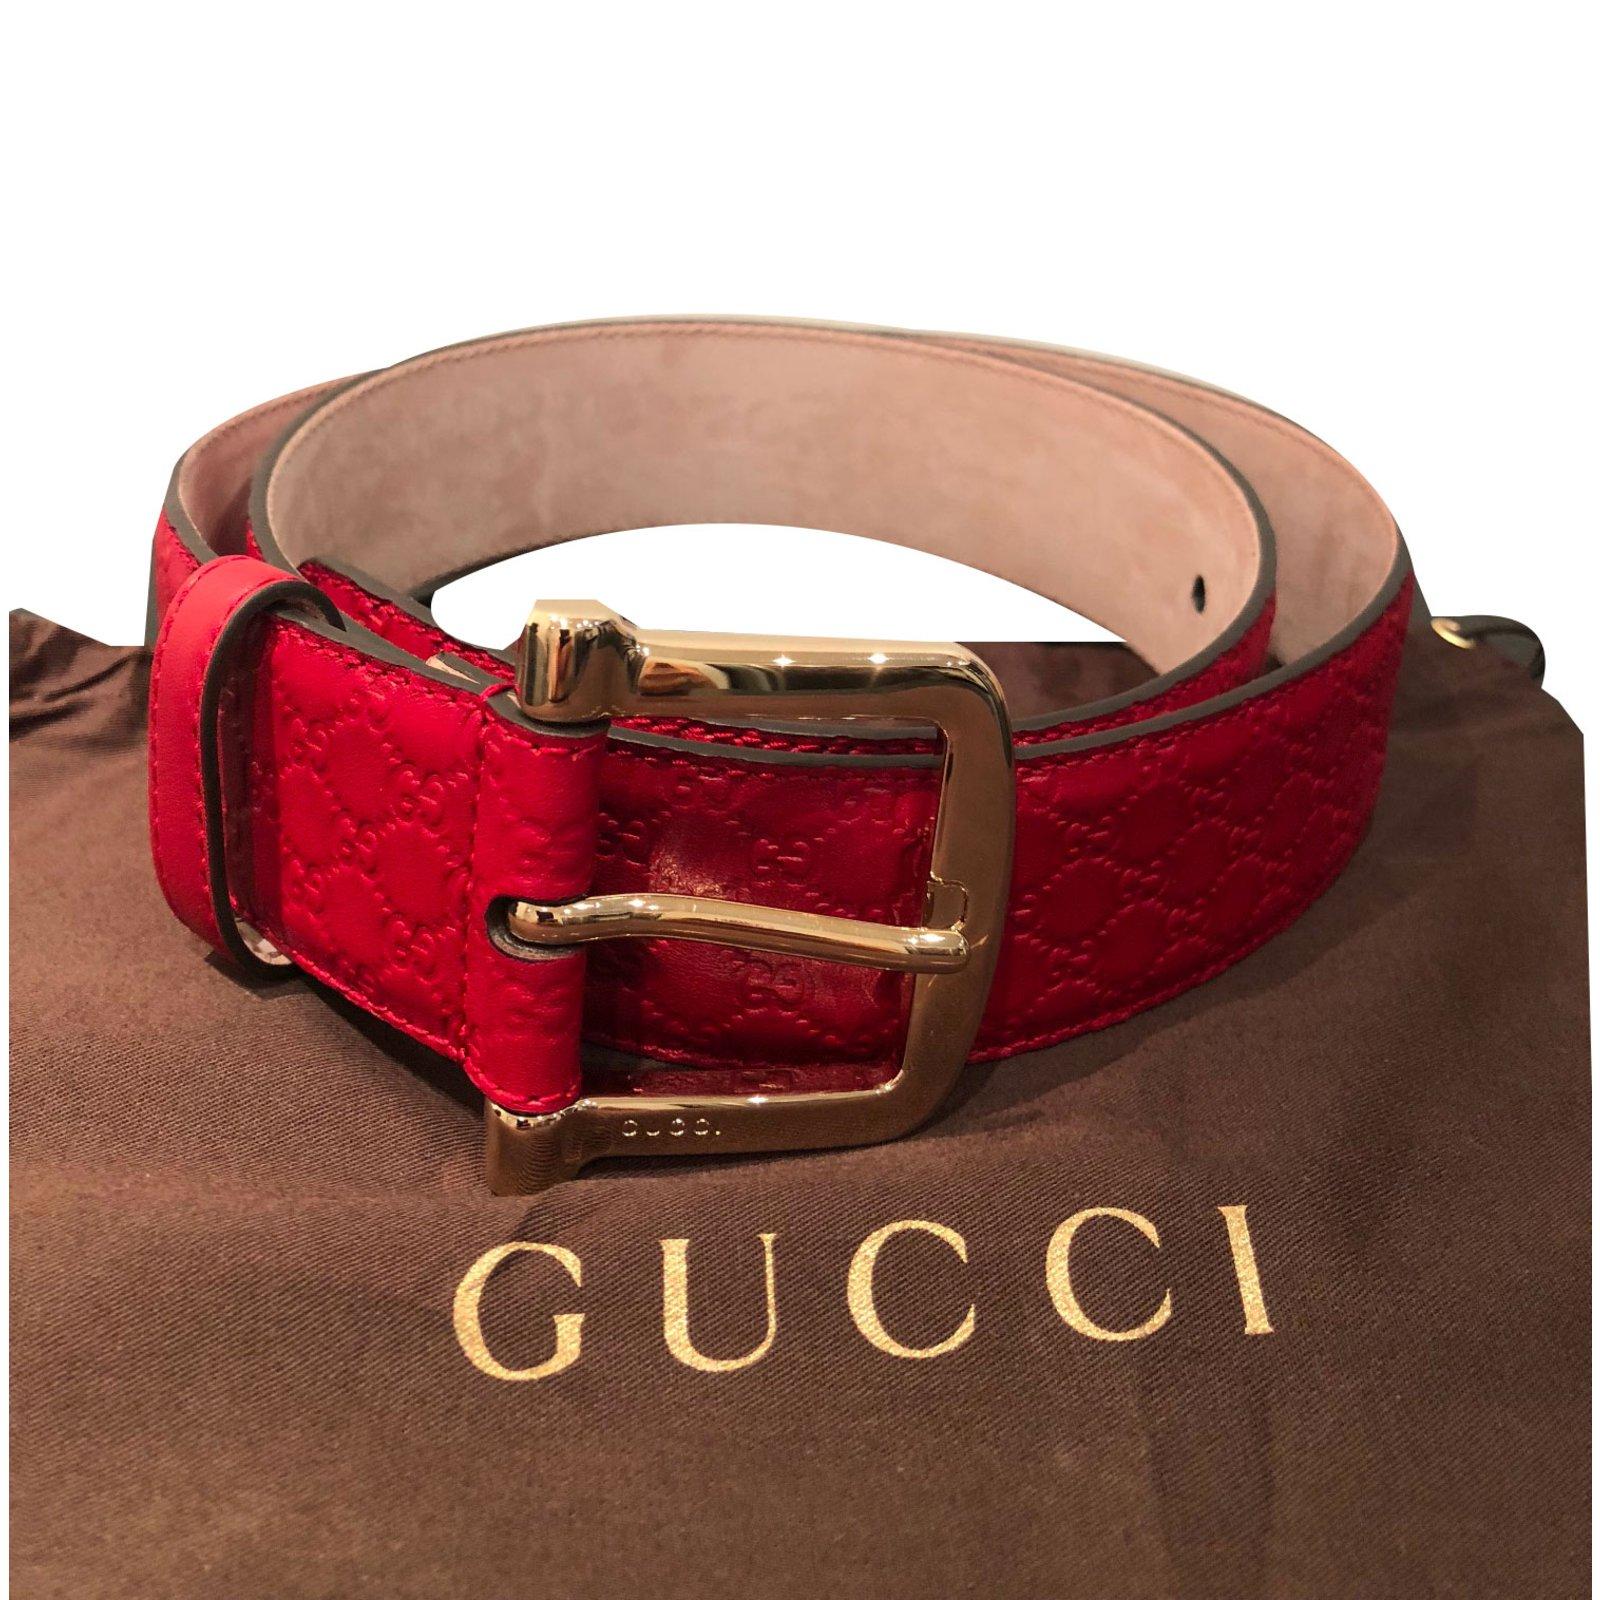 ea535d45f3c53 Gucci belt Belts Leather Red ref.74314 - Joli Closet